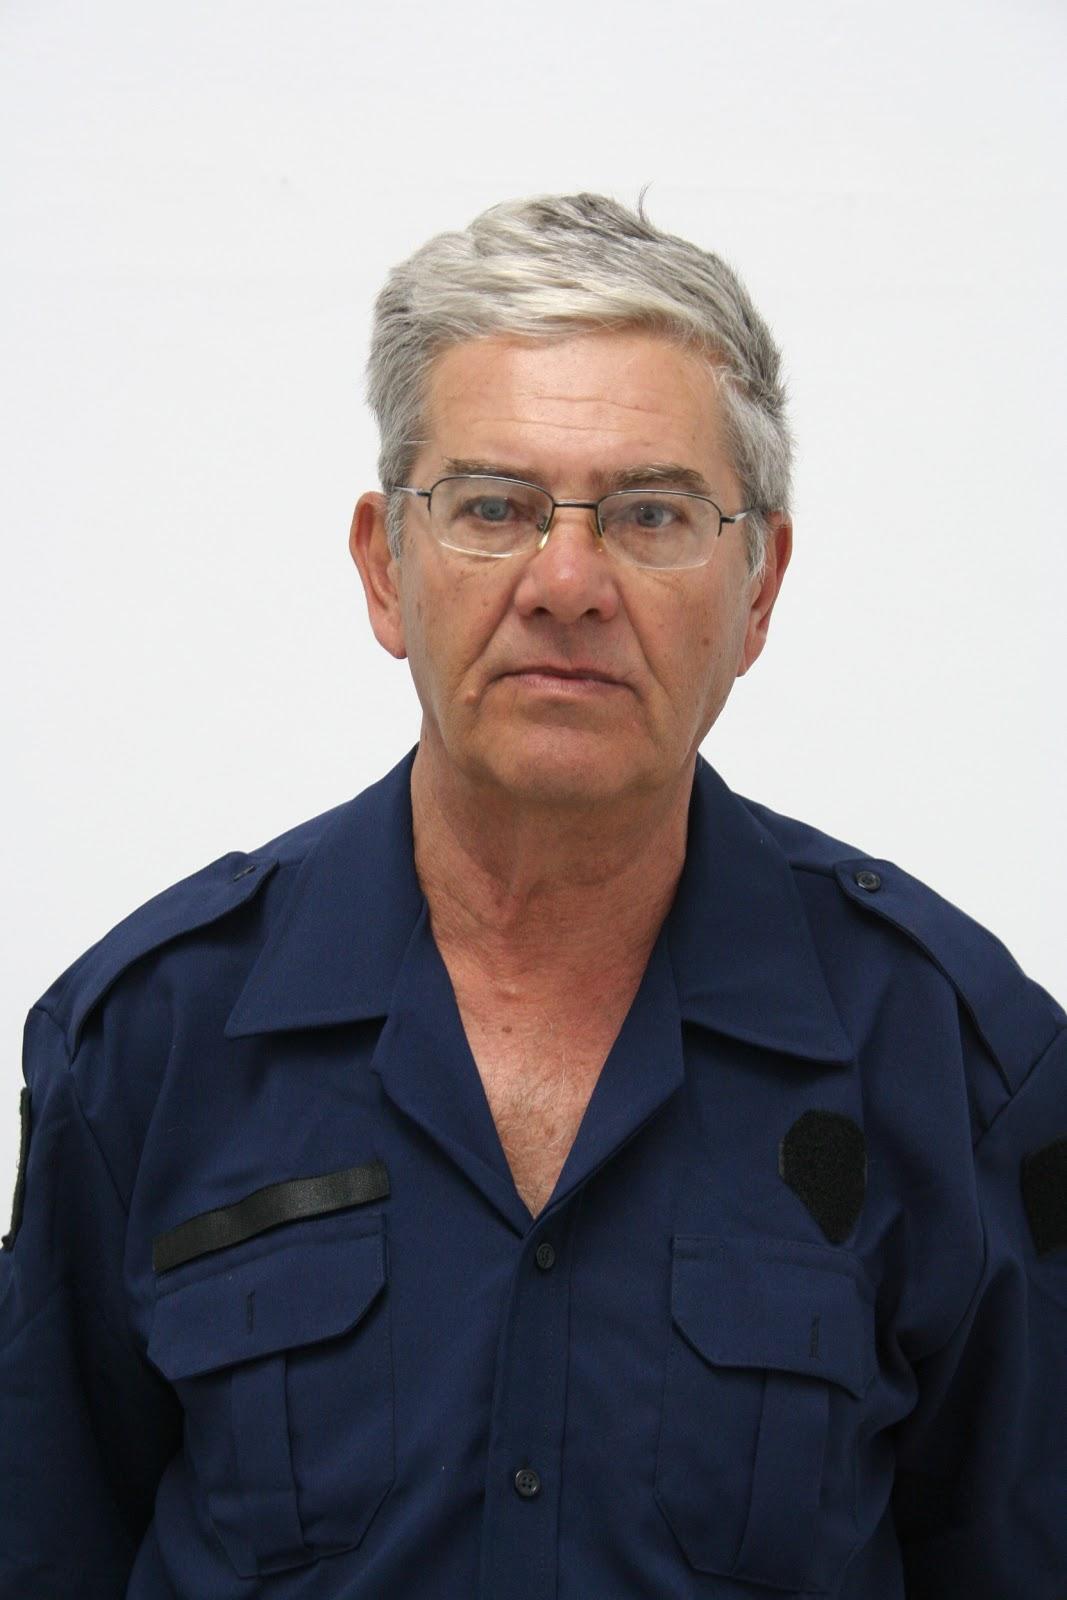 Morre comandante da Guarda Municipal de Bragança Paulista